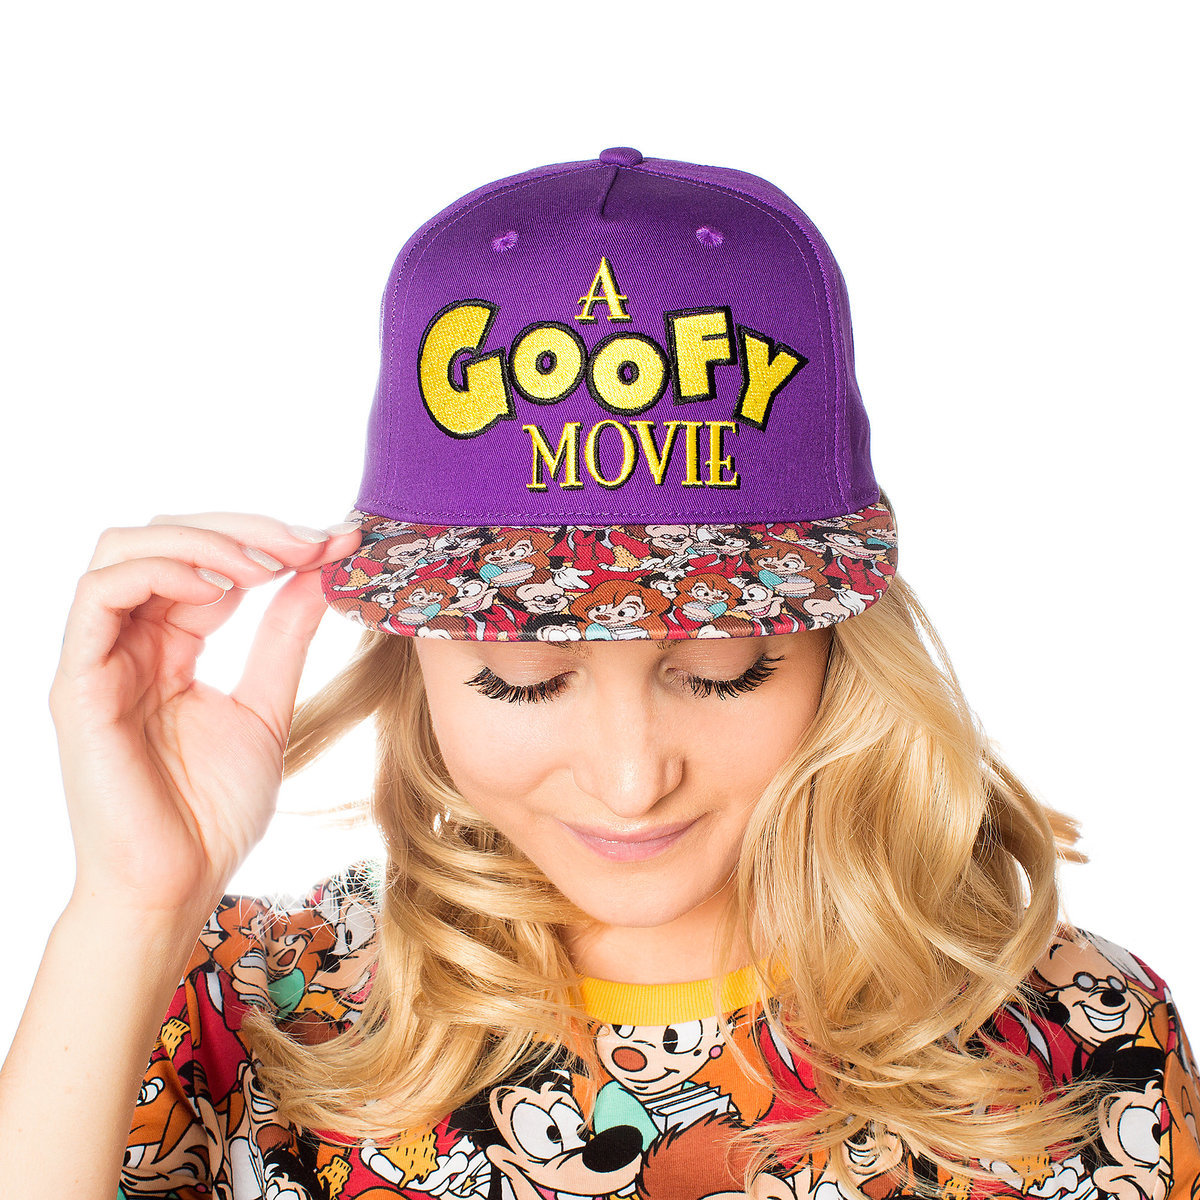 1a9f05bd3da5d A Goofy Movie Baseball Cap for Adults by Cakeworthy